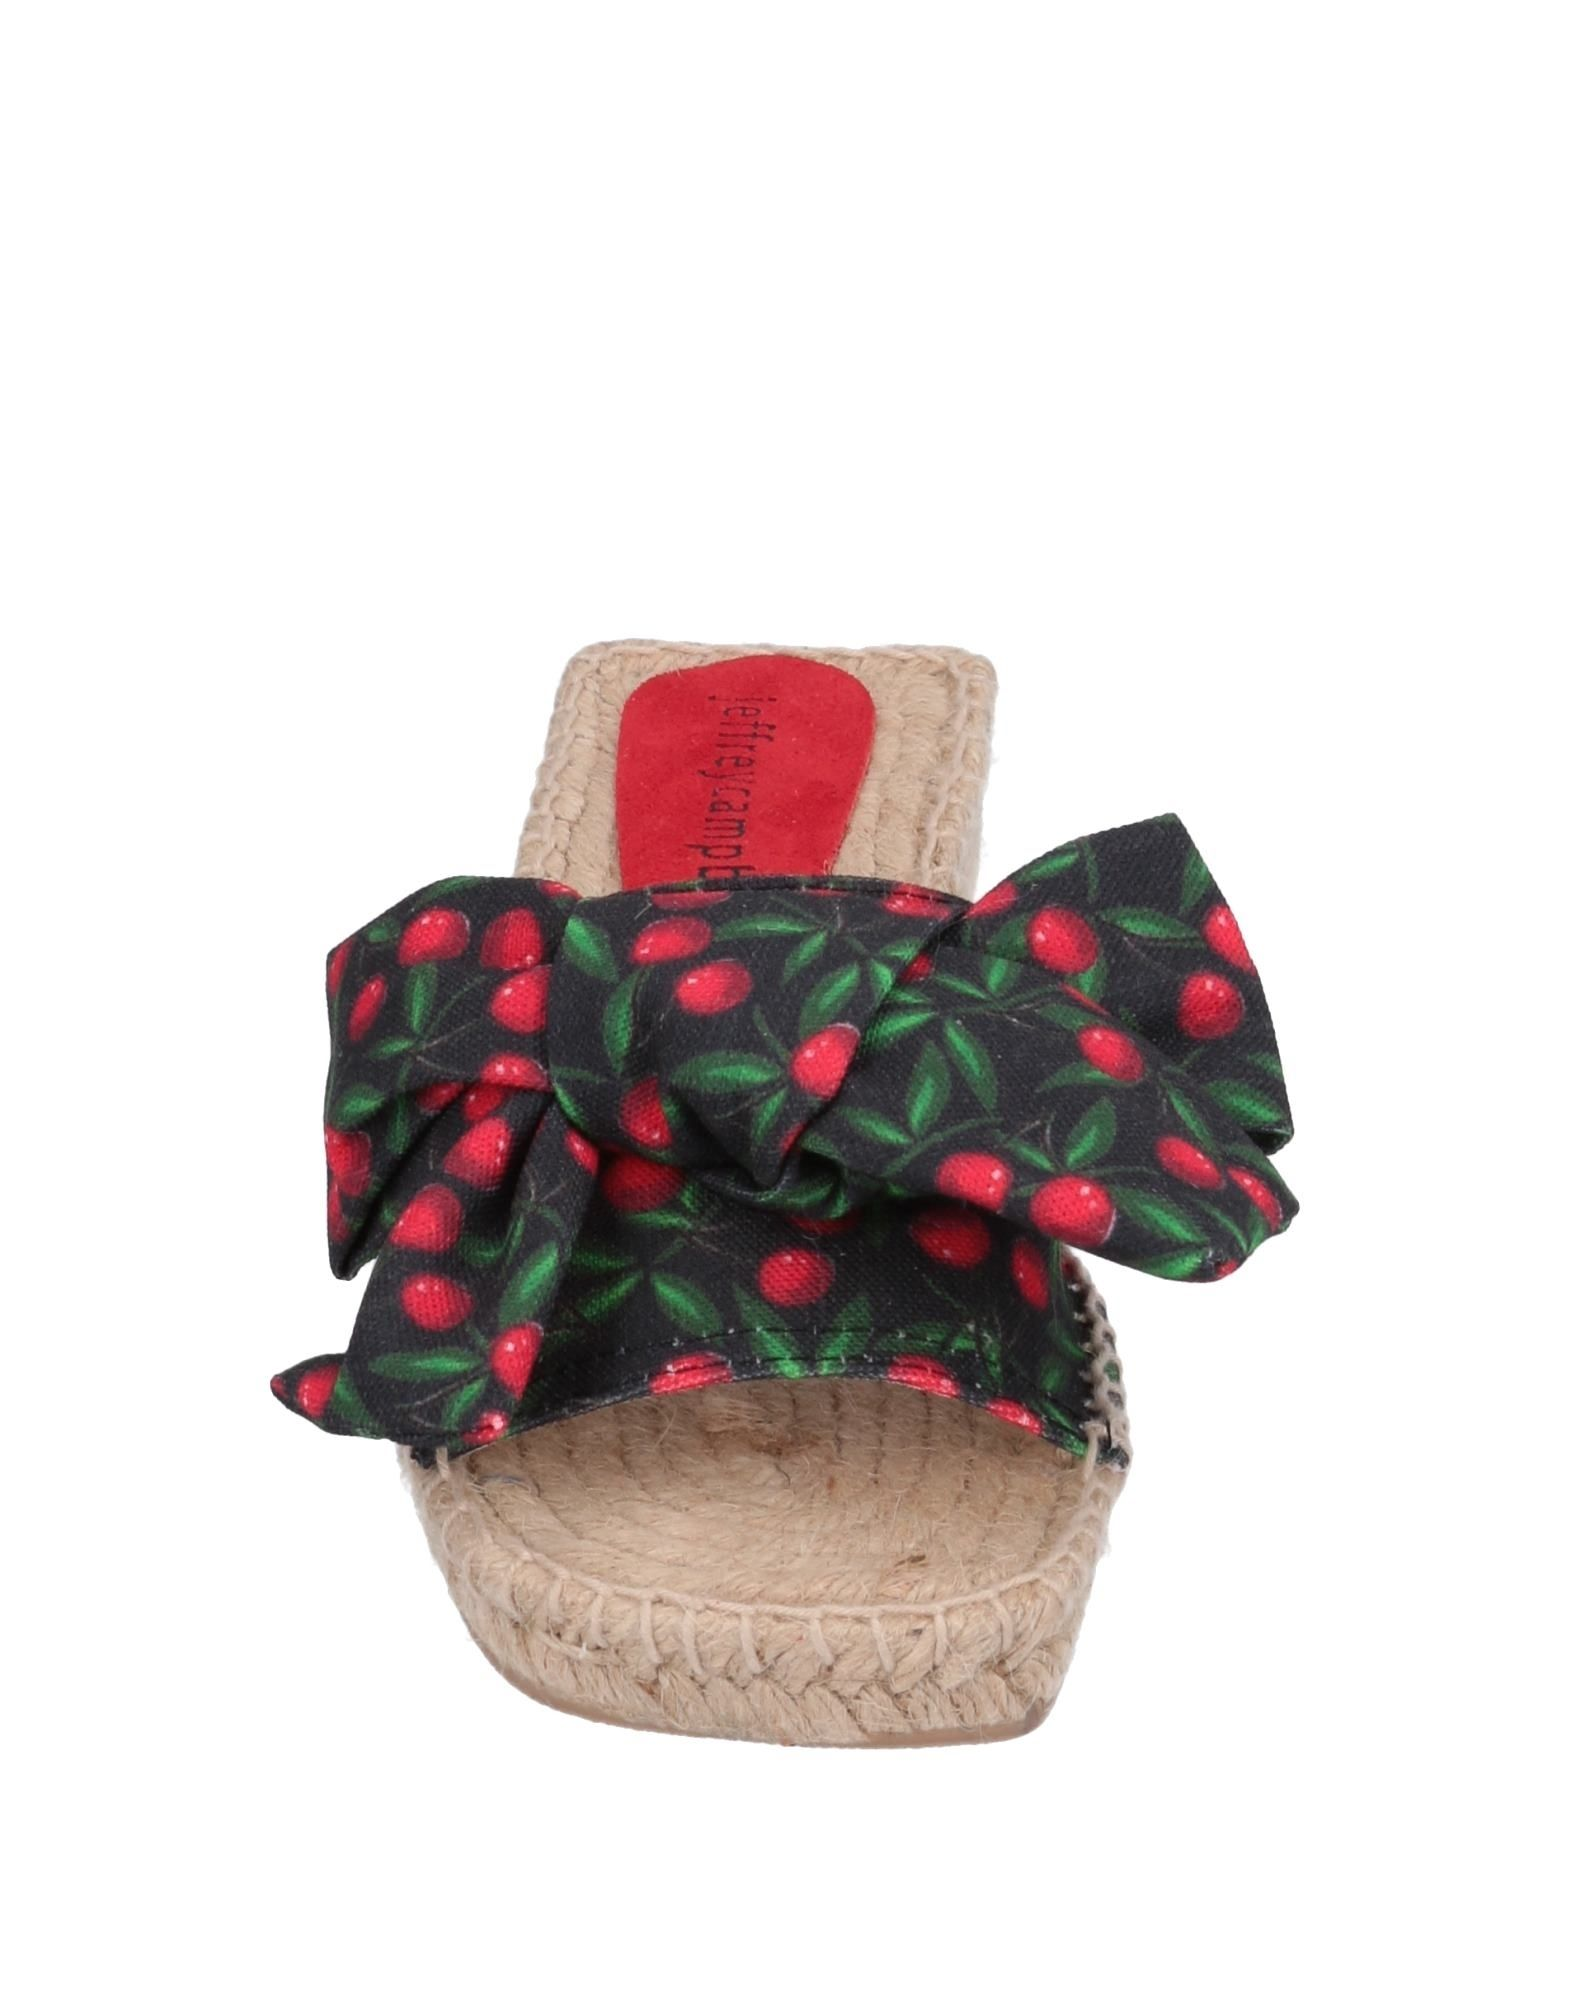 jeffrey campbell sandales sandales sandales - femmes jeffrey campbell sandales en ligne sur l'australie - 11565276ke e7a472